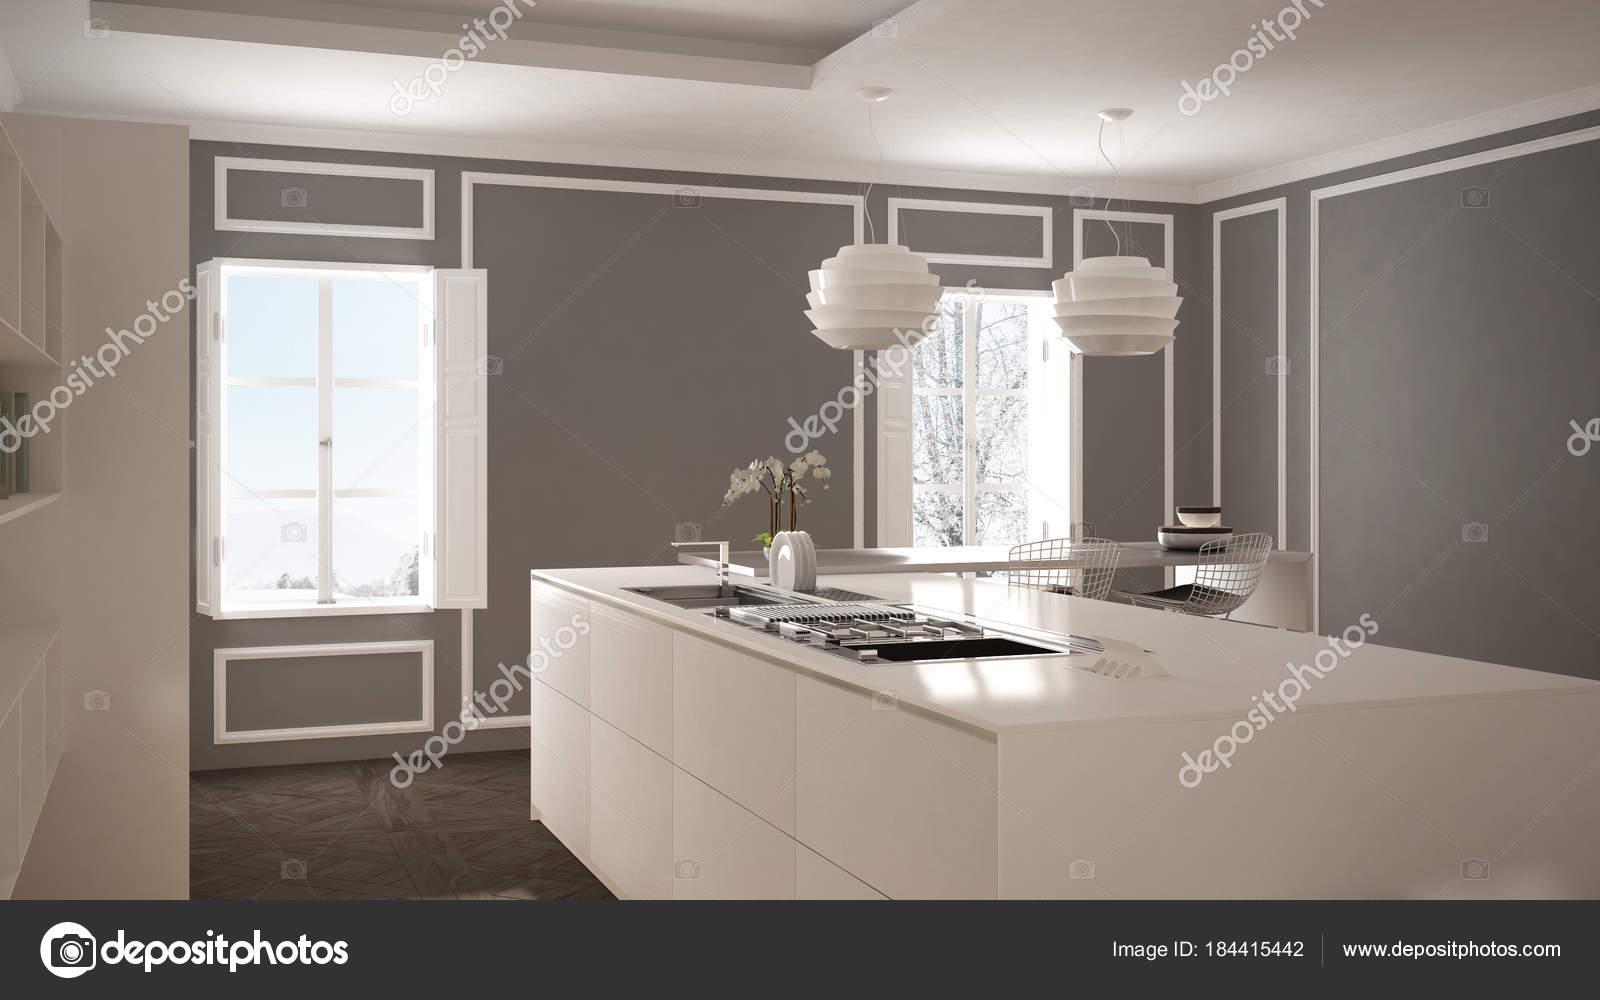 Sgabello Cucina Moderna : Cucina moderna in interni classici isola con sgabelli e due grande